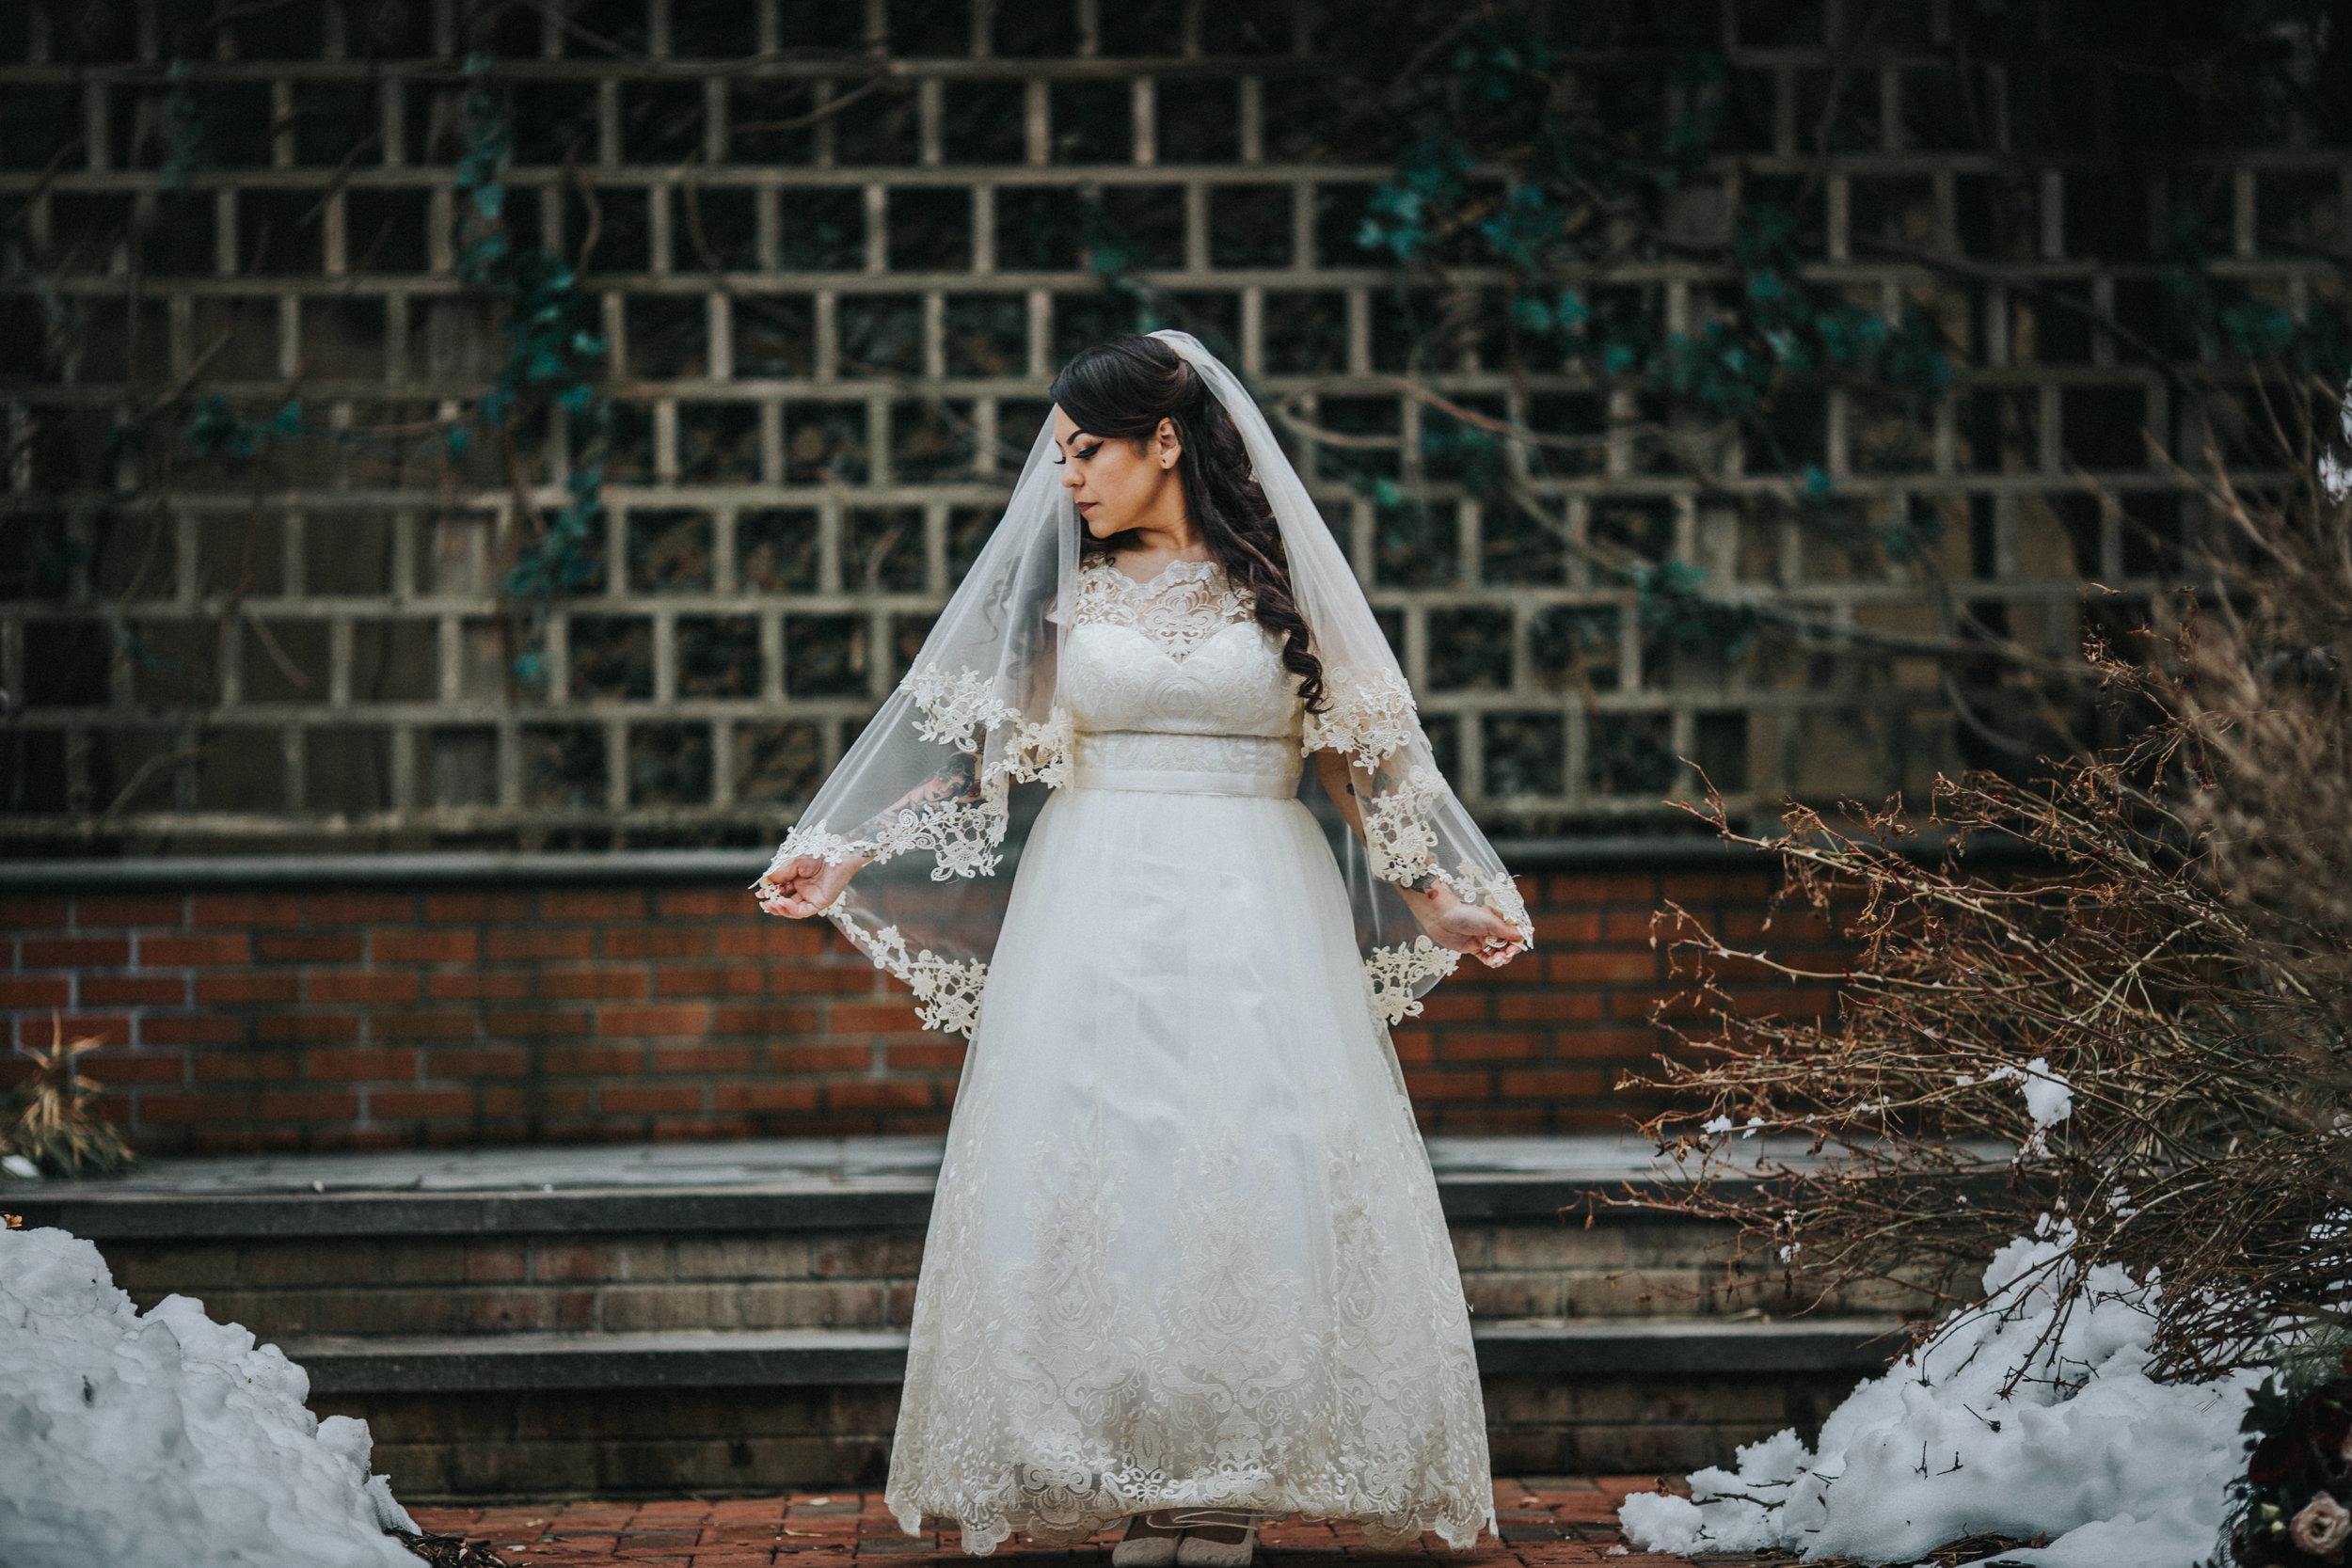 New-Jersey-Wedding-Photographer-ReceptionCenter-Valeria&Mike-First-Look-Bride&Groom (80 of 3).jpg